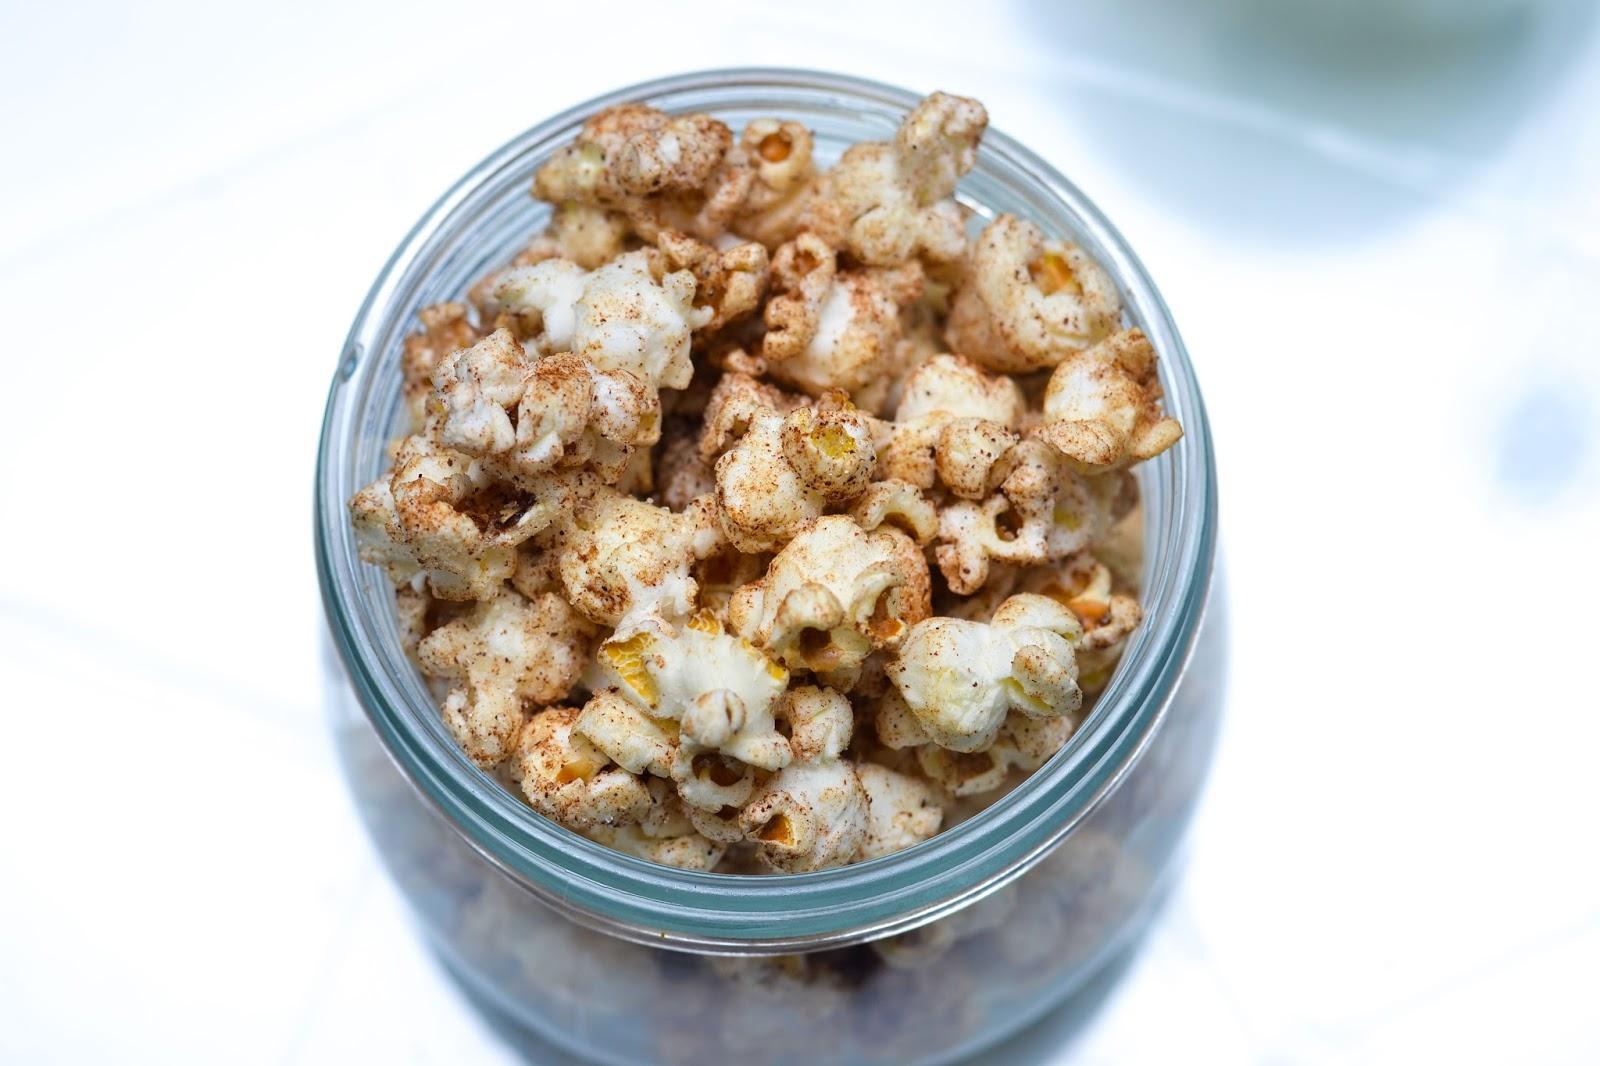 Cinnamon Sugar Popcorn in Lagos